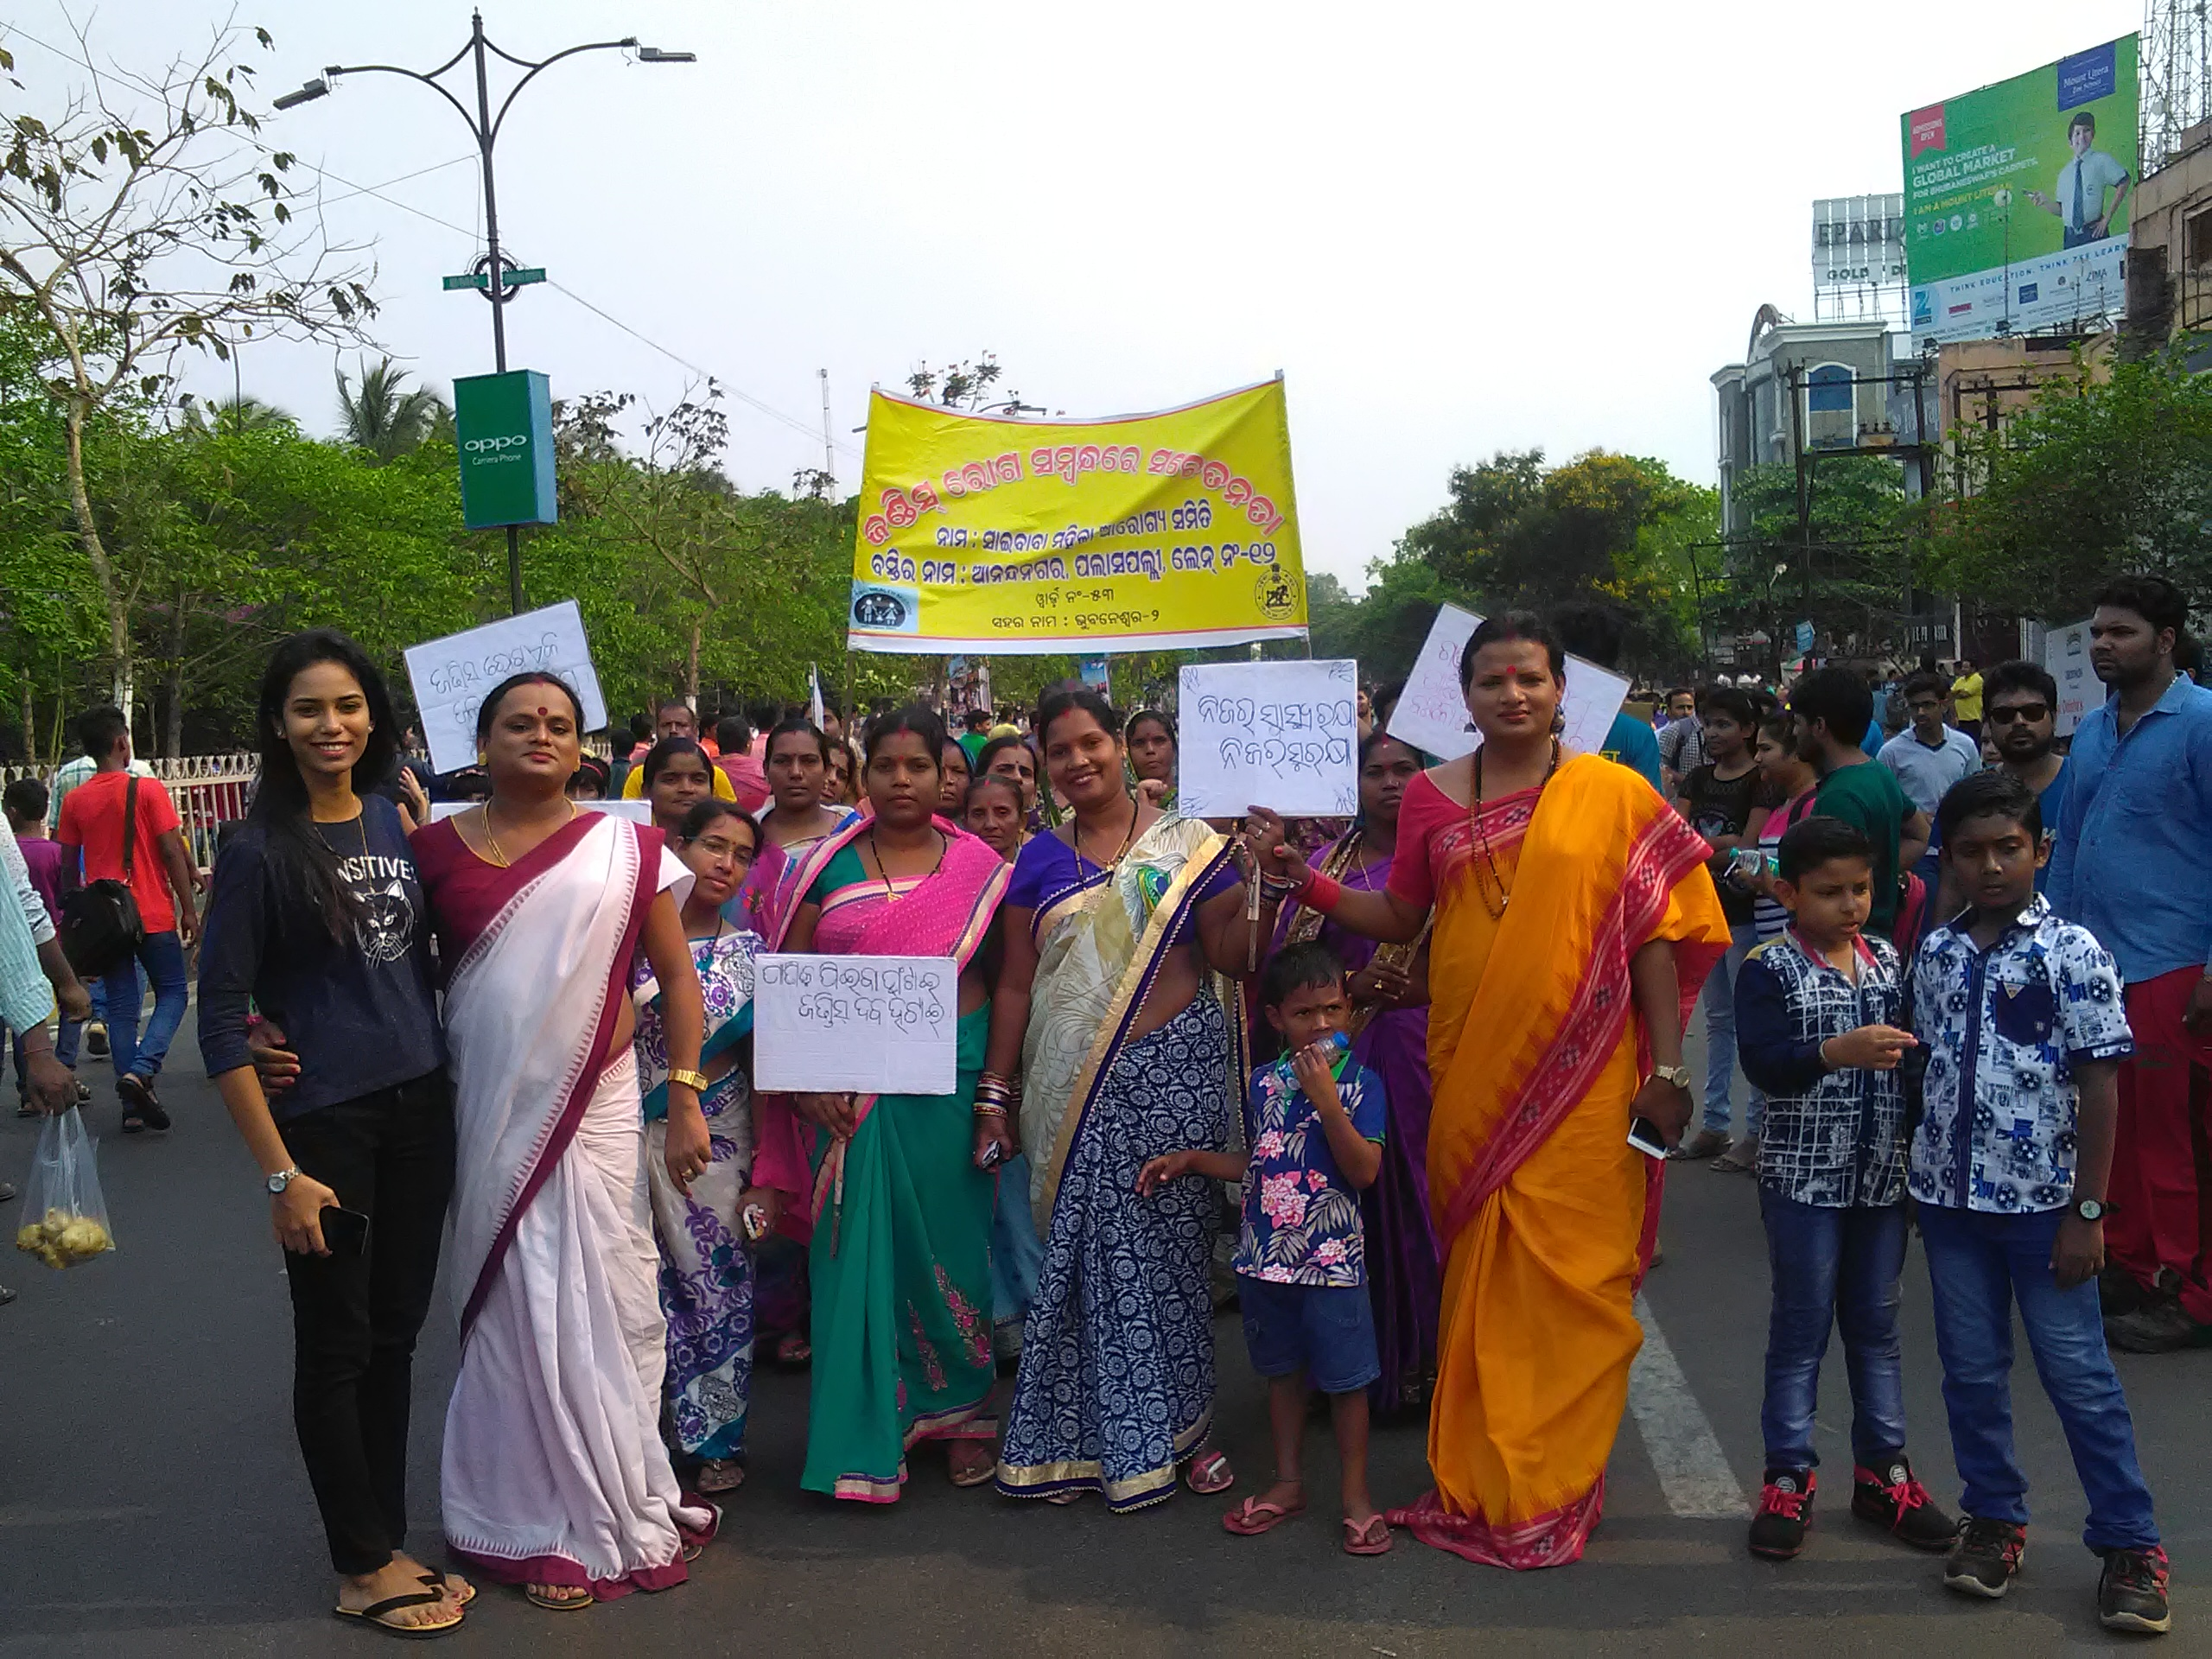 Saibaba Mahila Arogya Samiti Palaspalli on a jaundice awareness walk in Patha Utsav